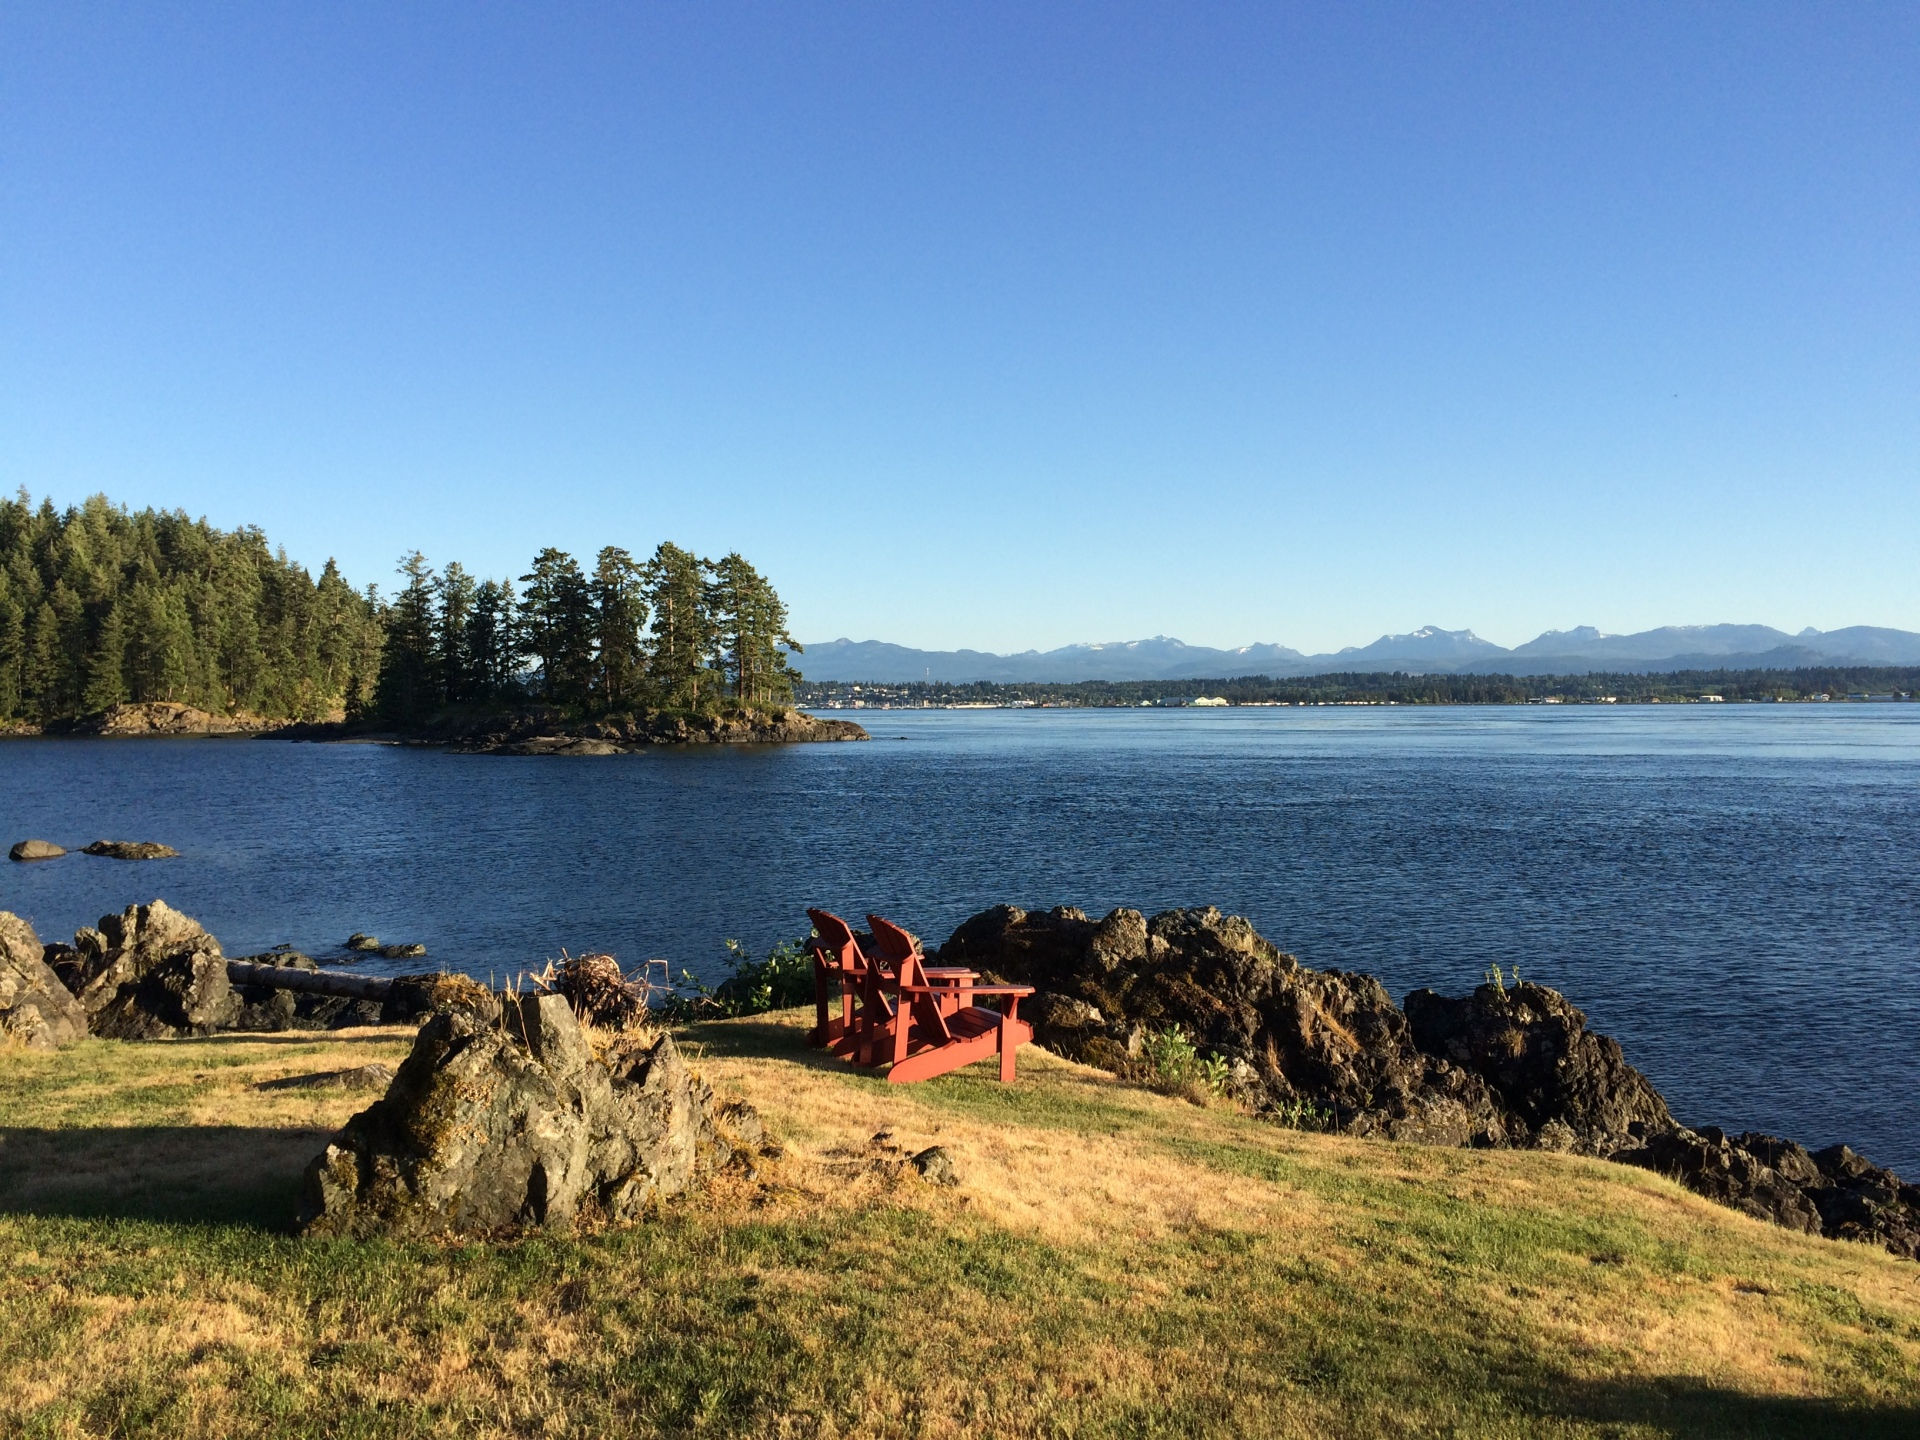 Quadra Island, B.C.